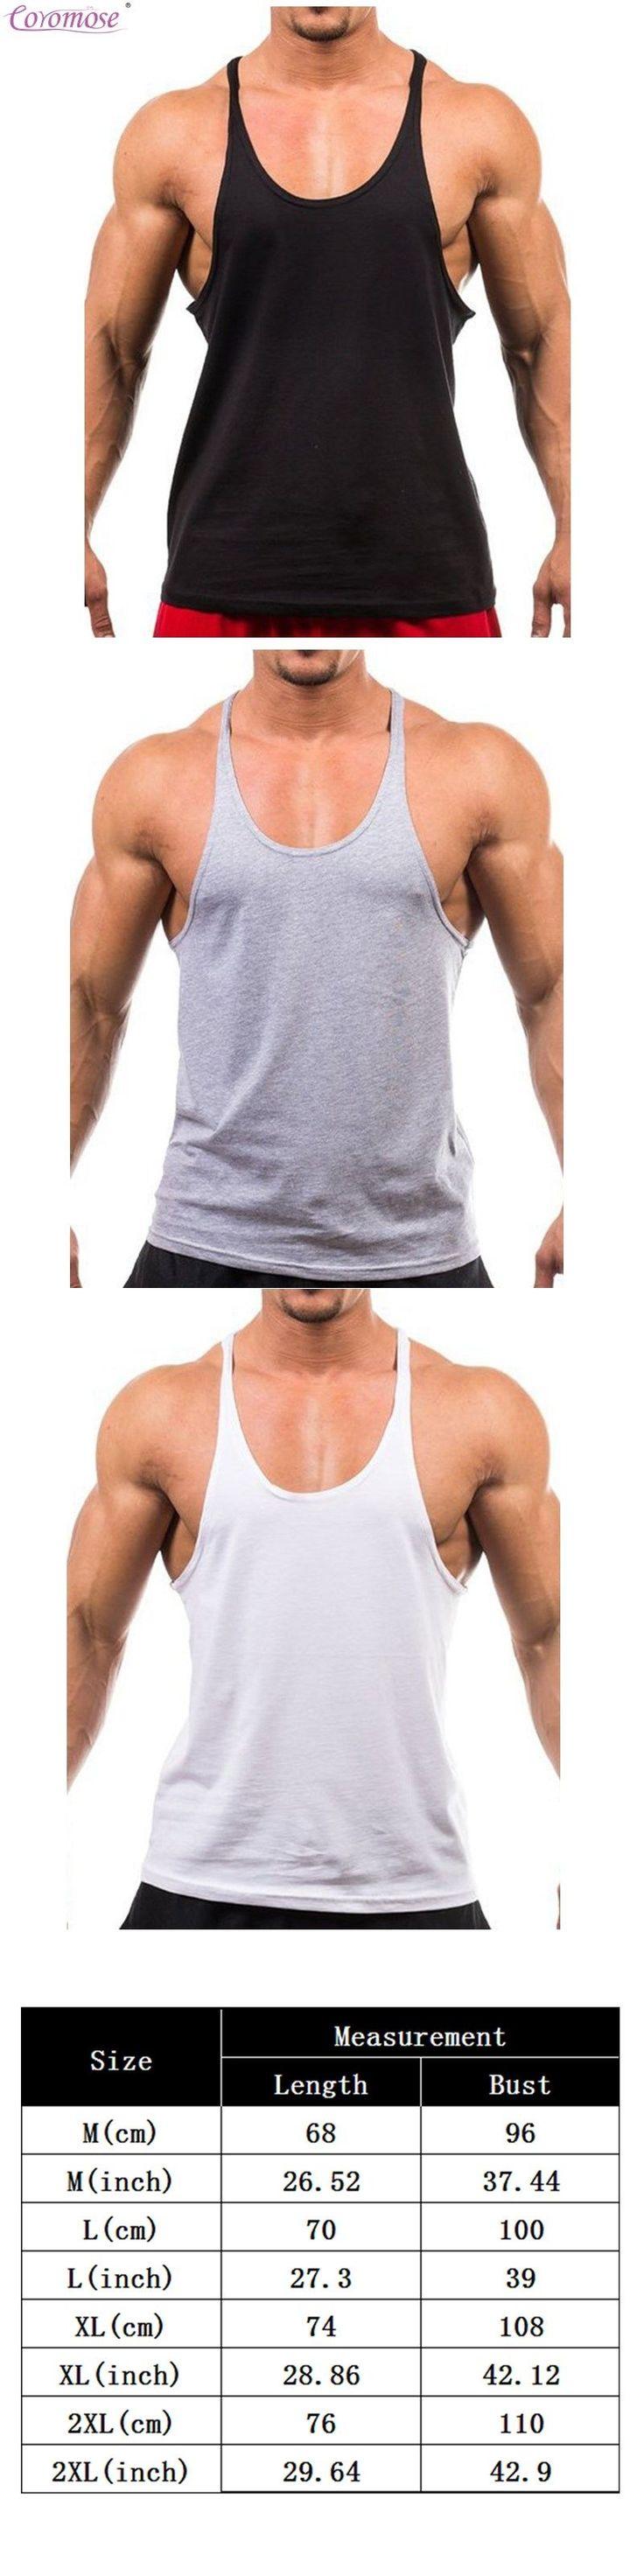 Coromose Men's Vest Basic Solid Bodybuilding Tank Tops Workout Fitness male Cotton Loose T shirt  2017 Fashion